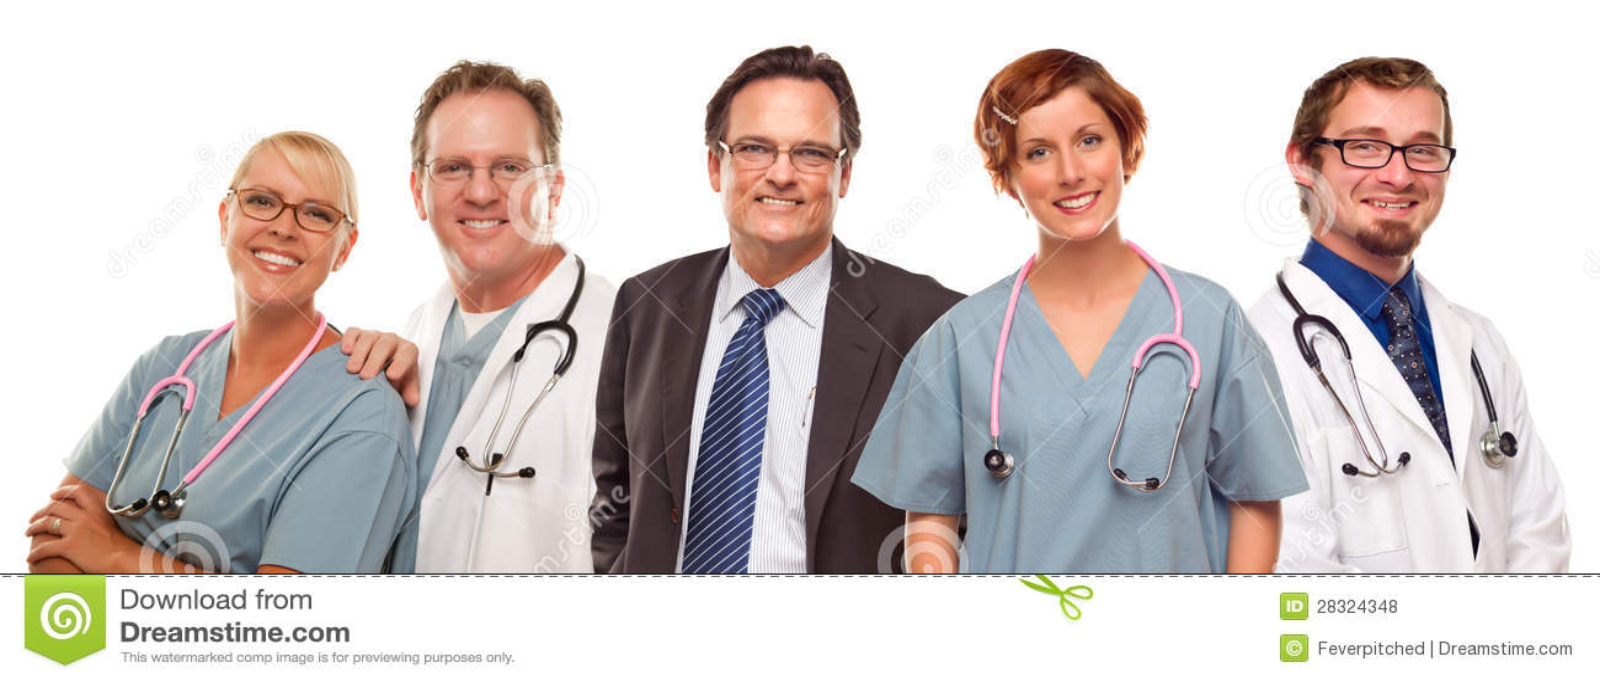 Grupa lekarki, pielęgniarki lub biznesmen na bielu